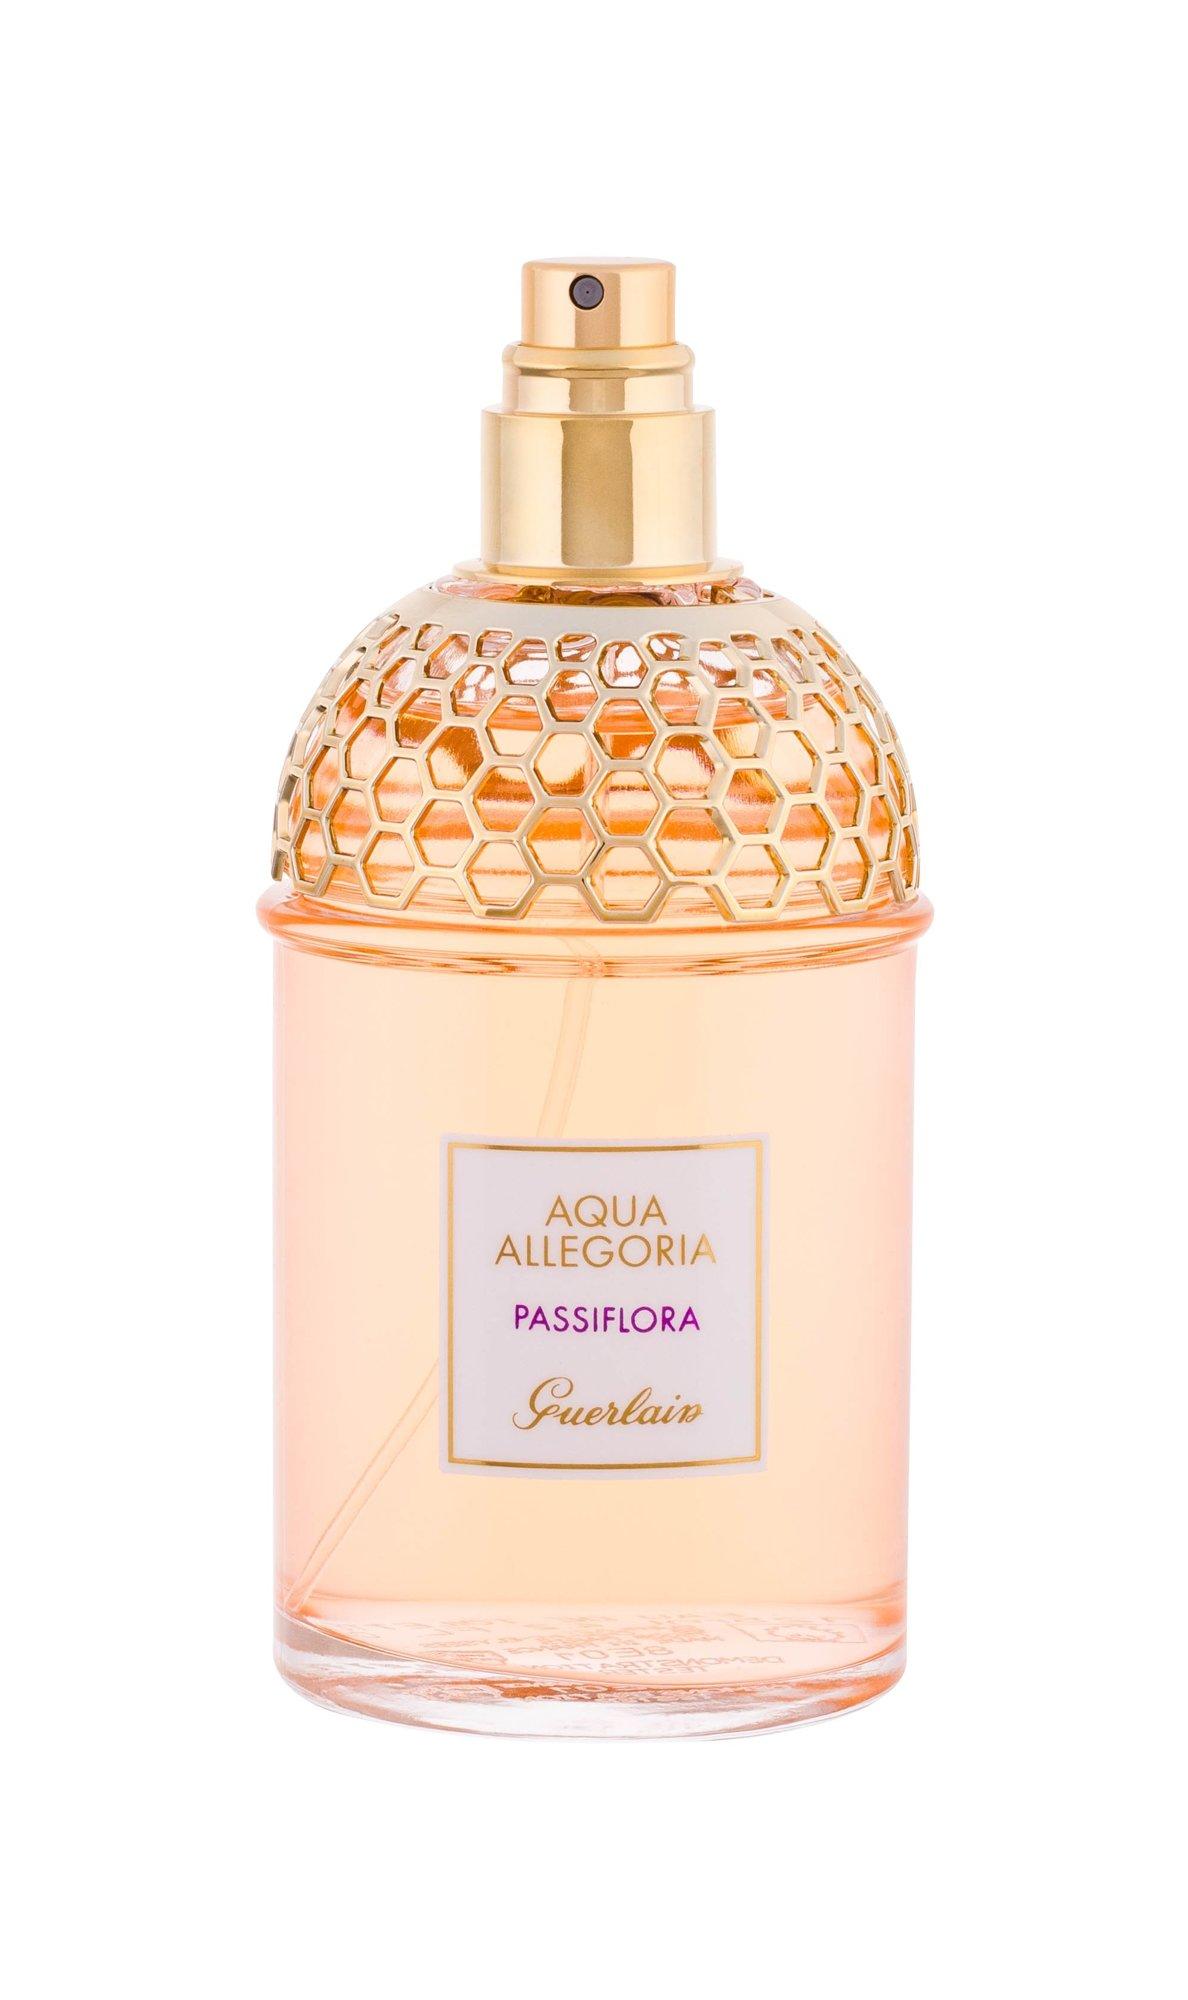 Guerlain Aqua Allegoria Passiflora, Toaletní voda 125ml, Tester